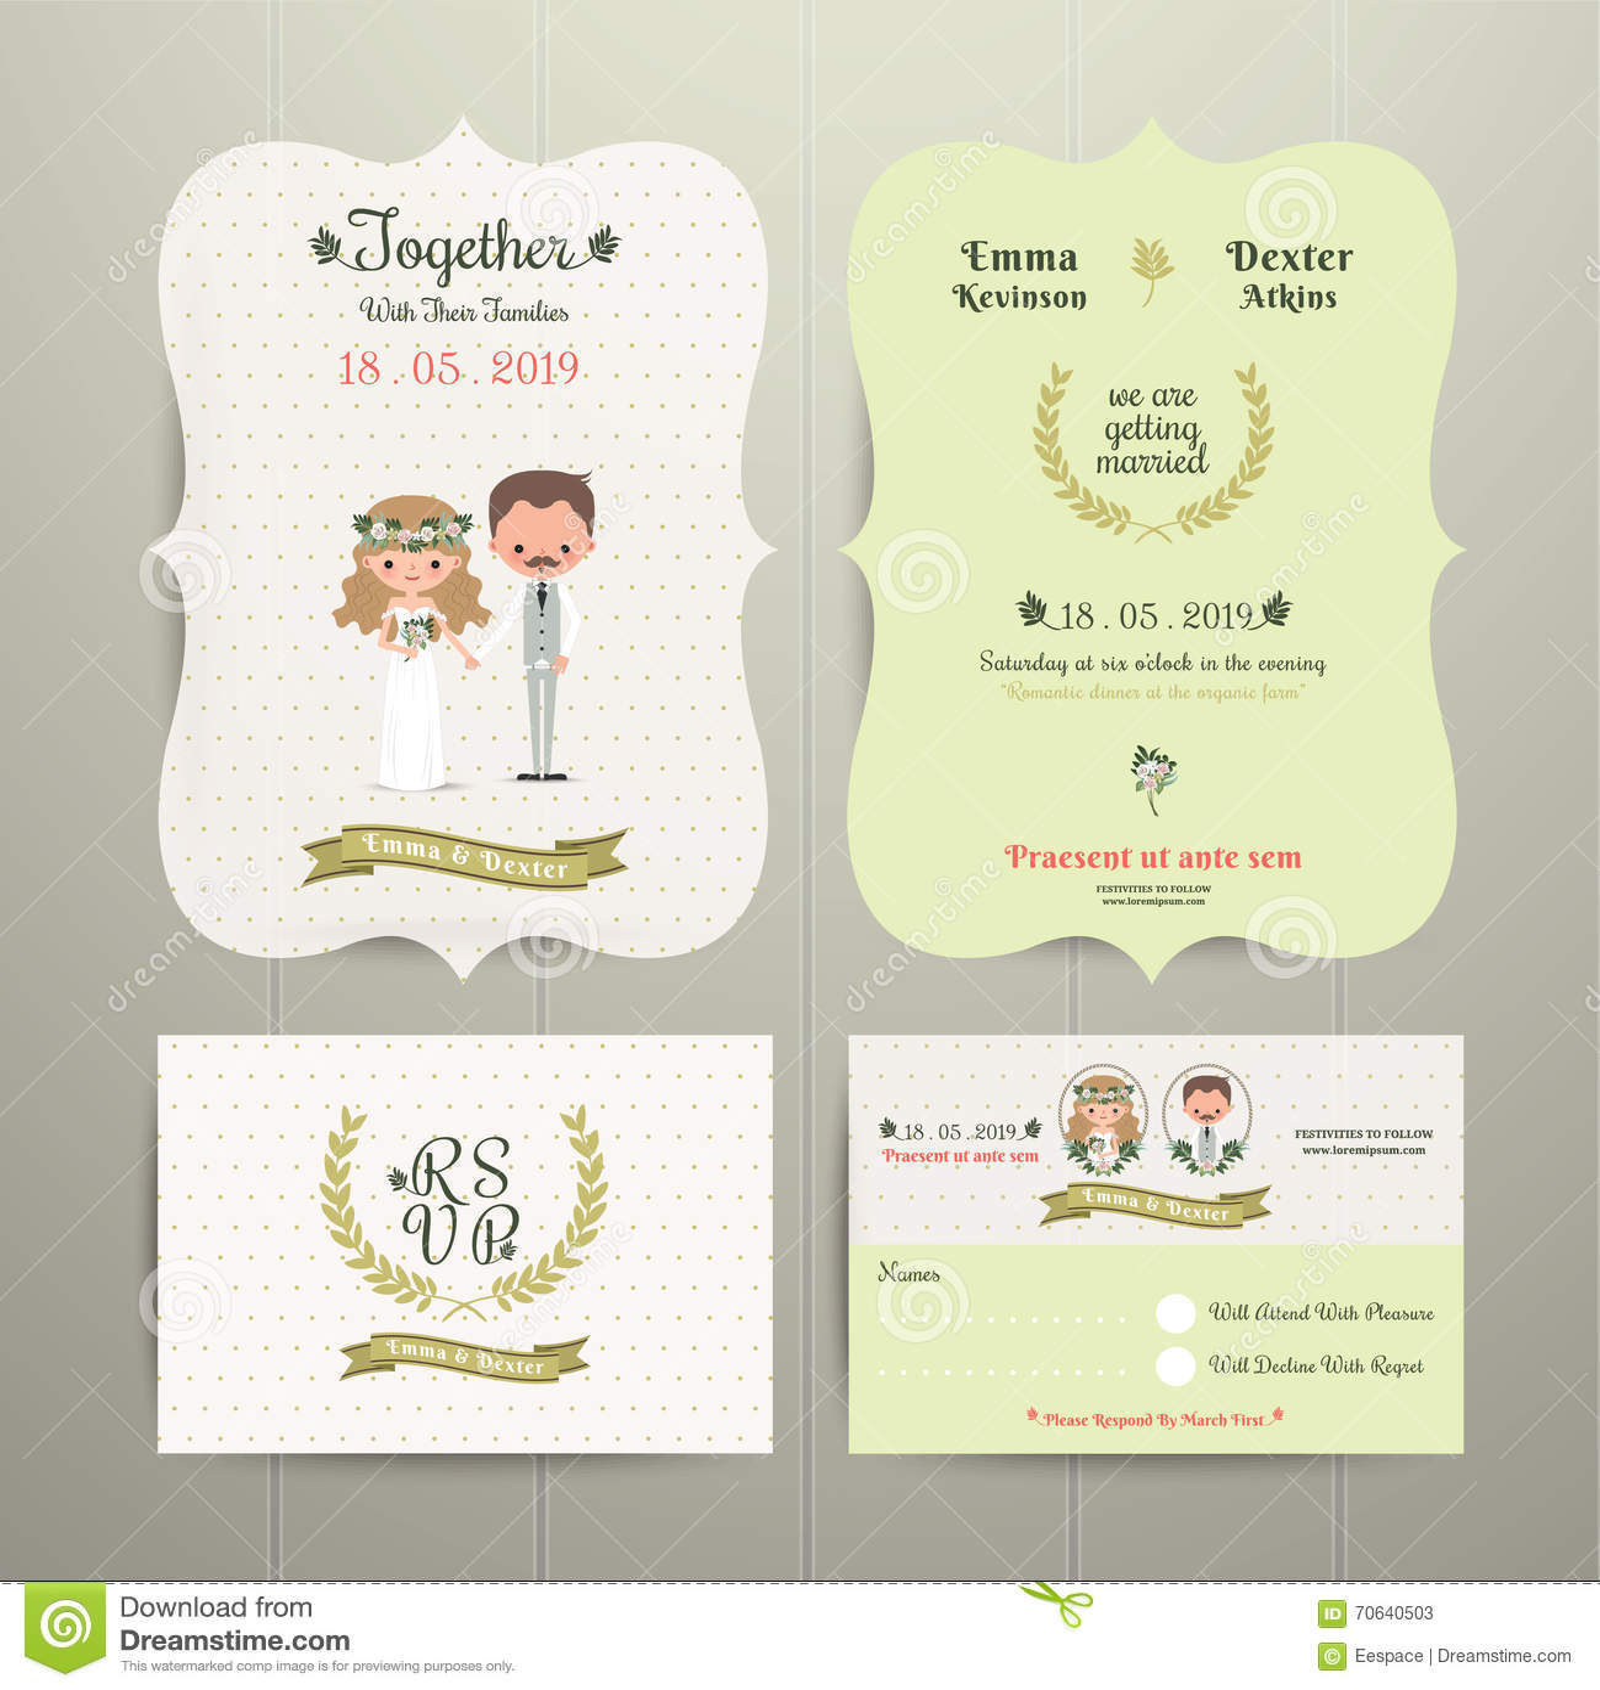 Bride Groom Cartoon Romantic Farm Wedding Invitation Card And